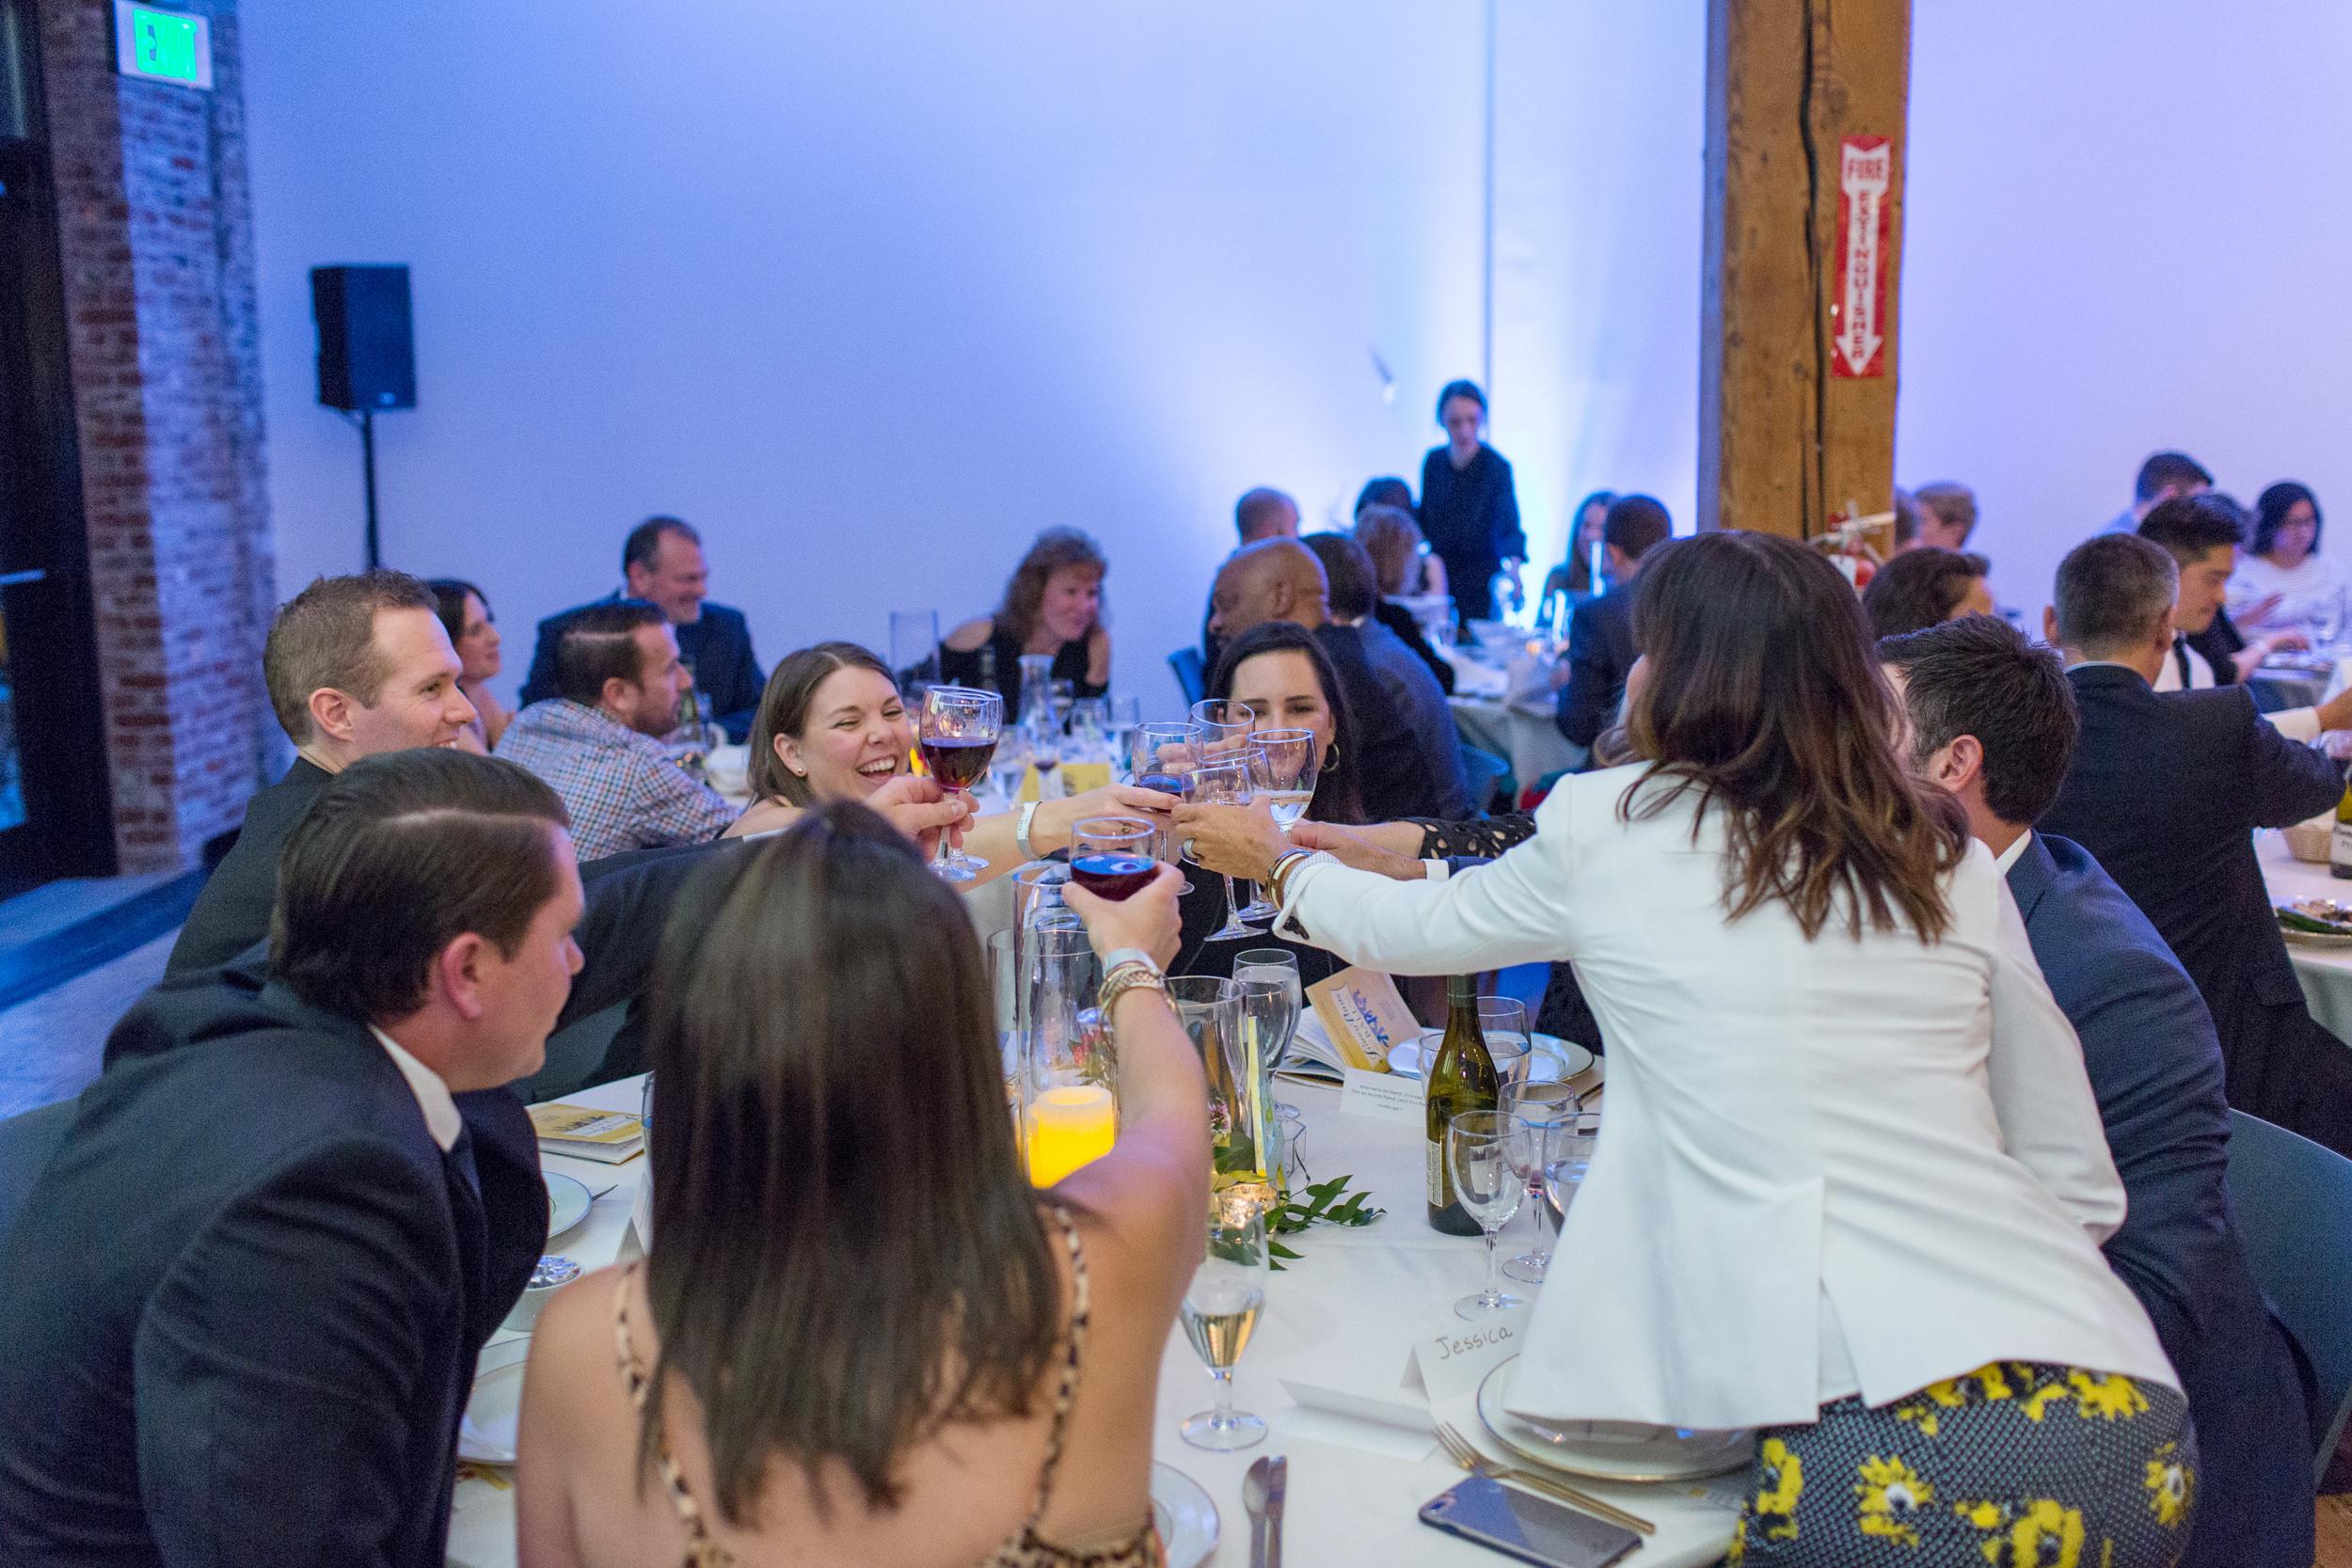 portland-corporate-event-photographer-09.jpg